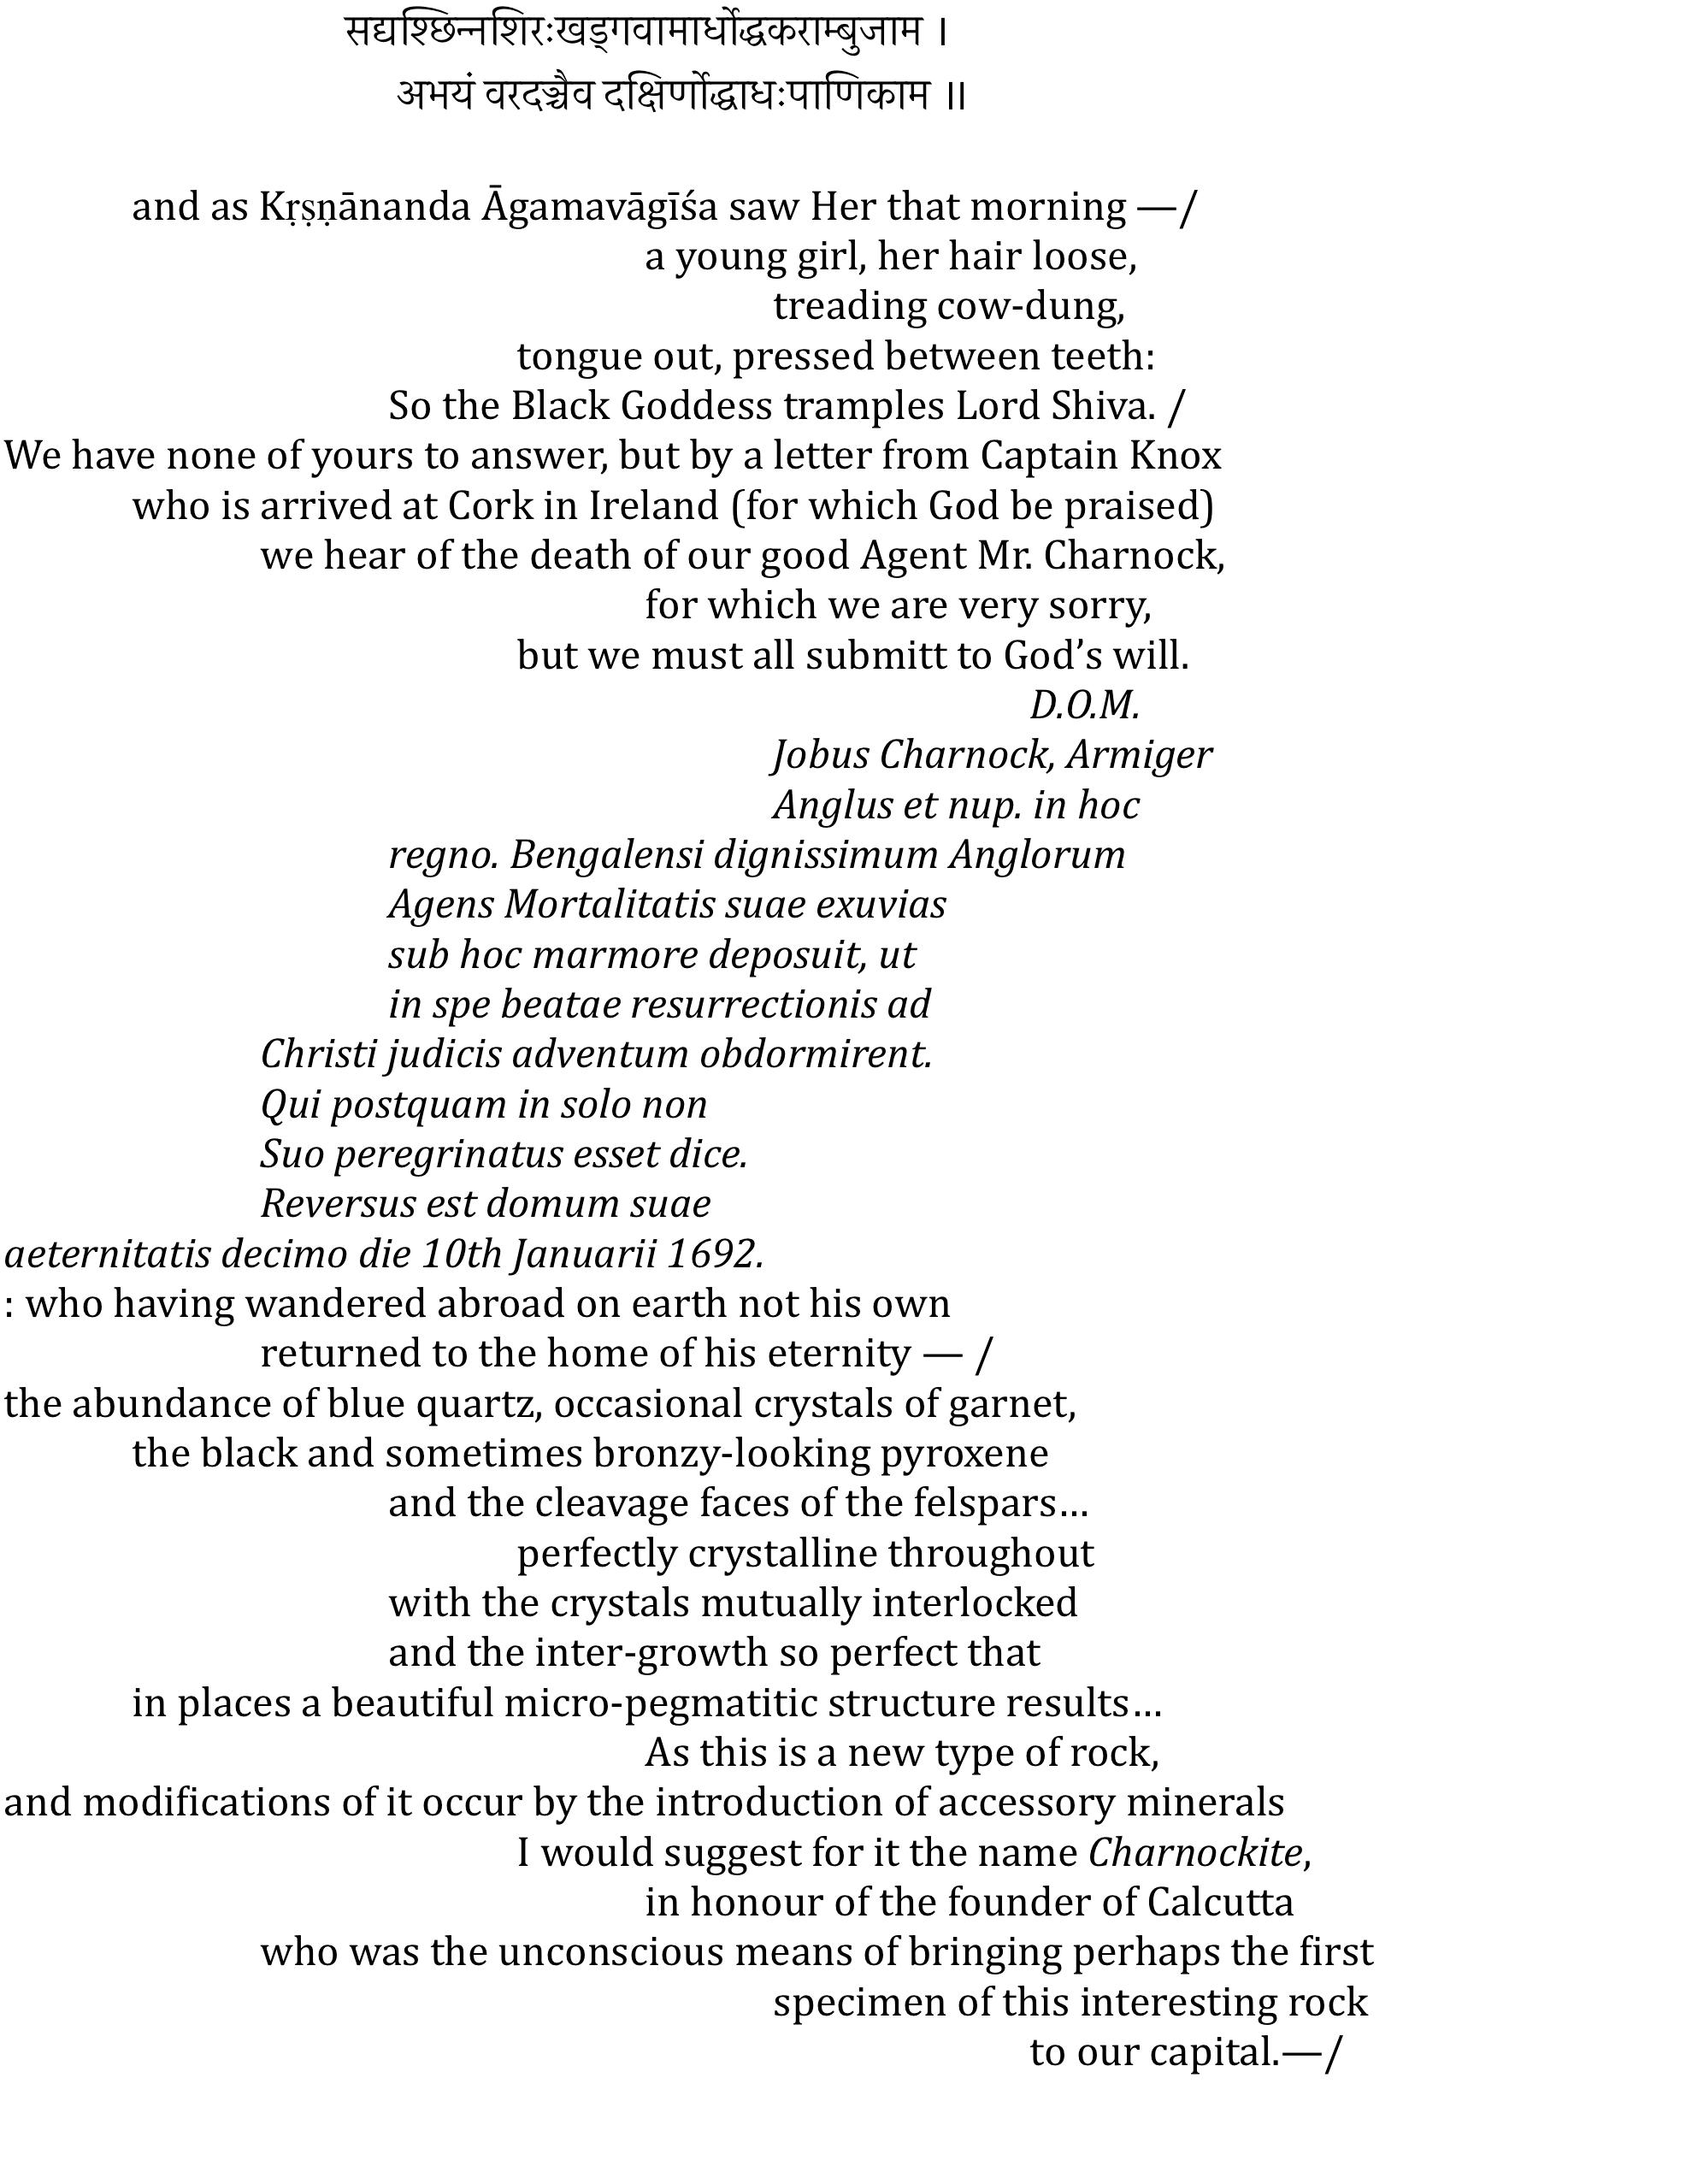 tentacular-ashford-10.png